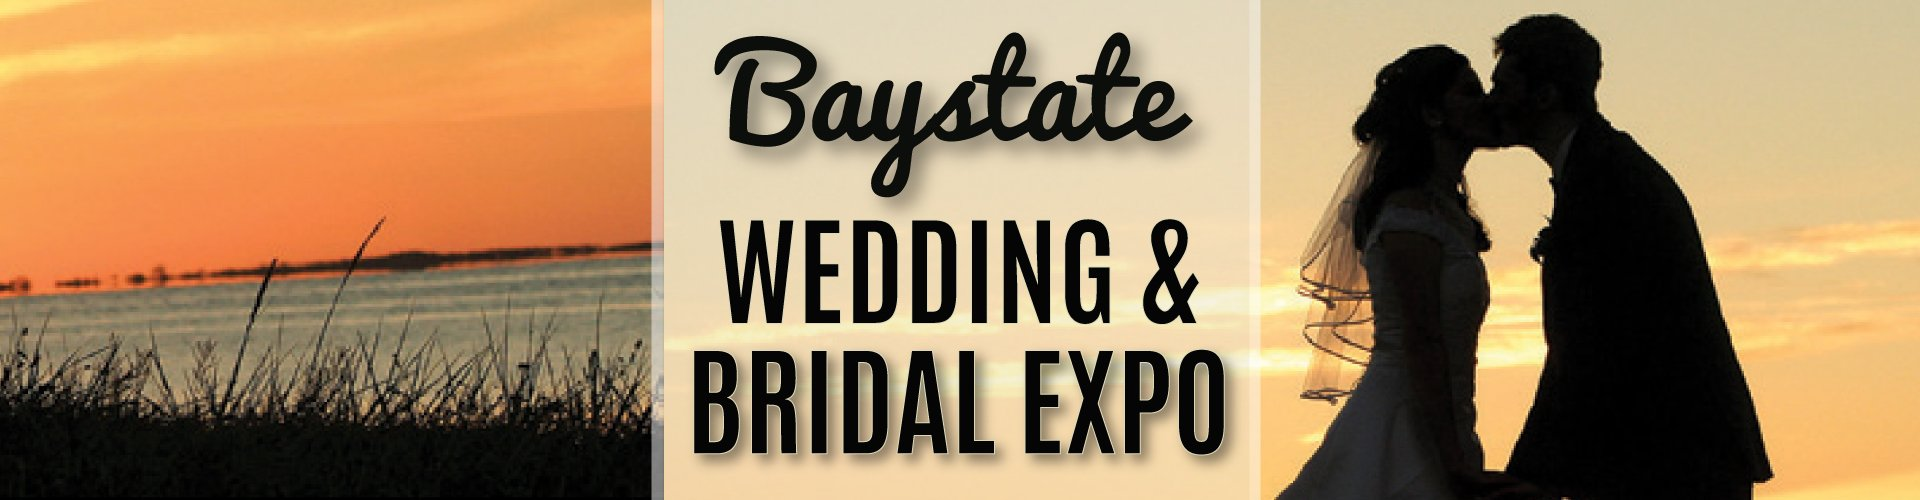 ed5fc3284 Baystate Boston Wedding   Bridal Expo Jan 26